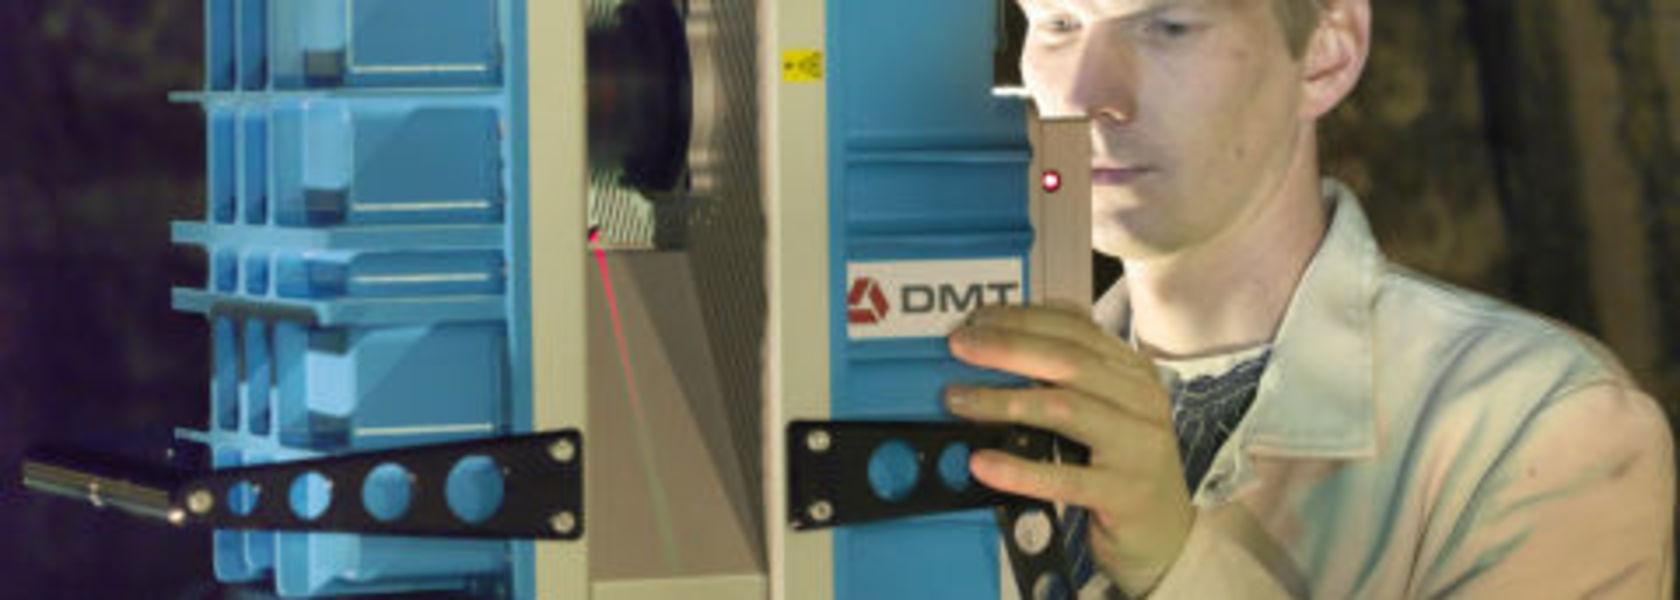 DMT renames subsidiaries - Mining Magazine